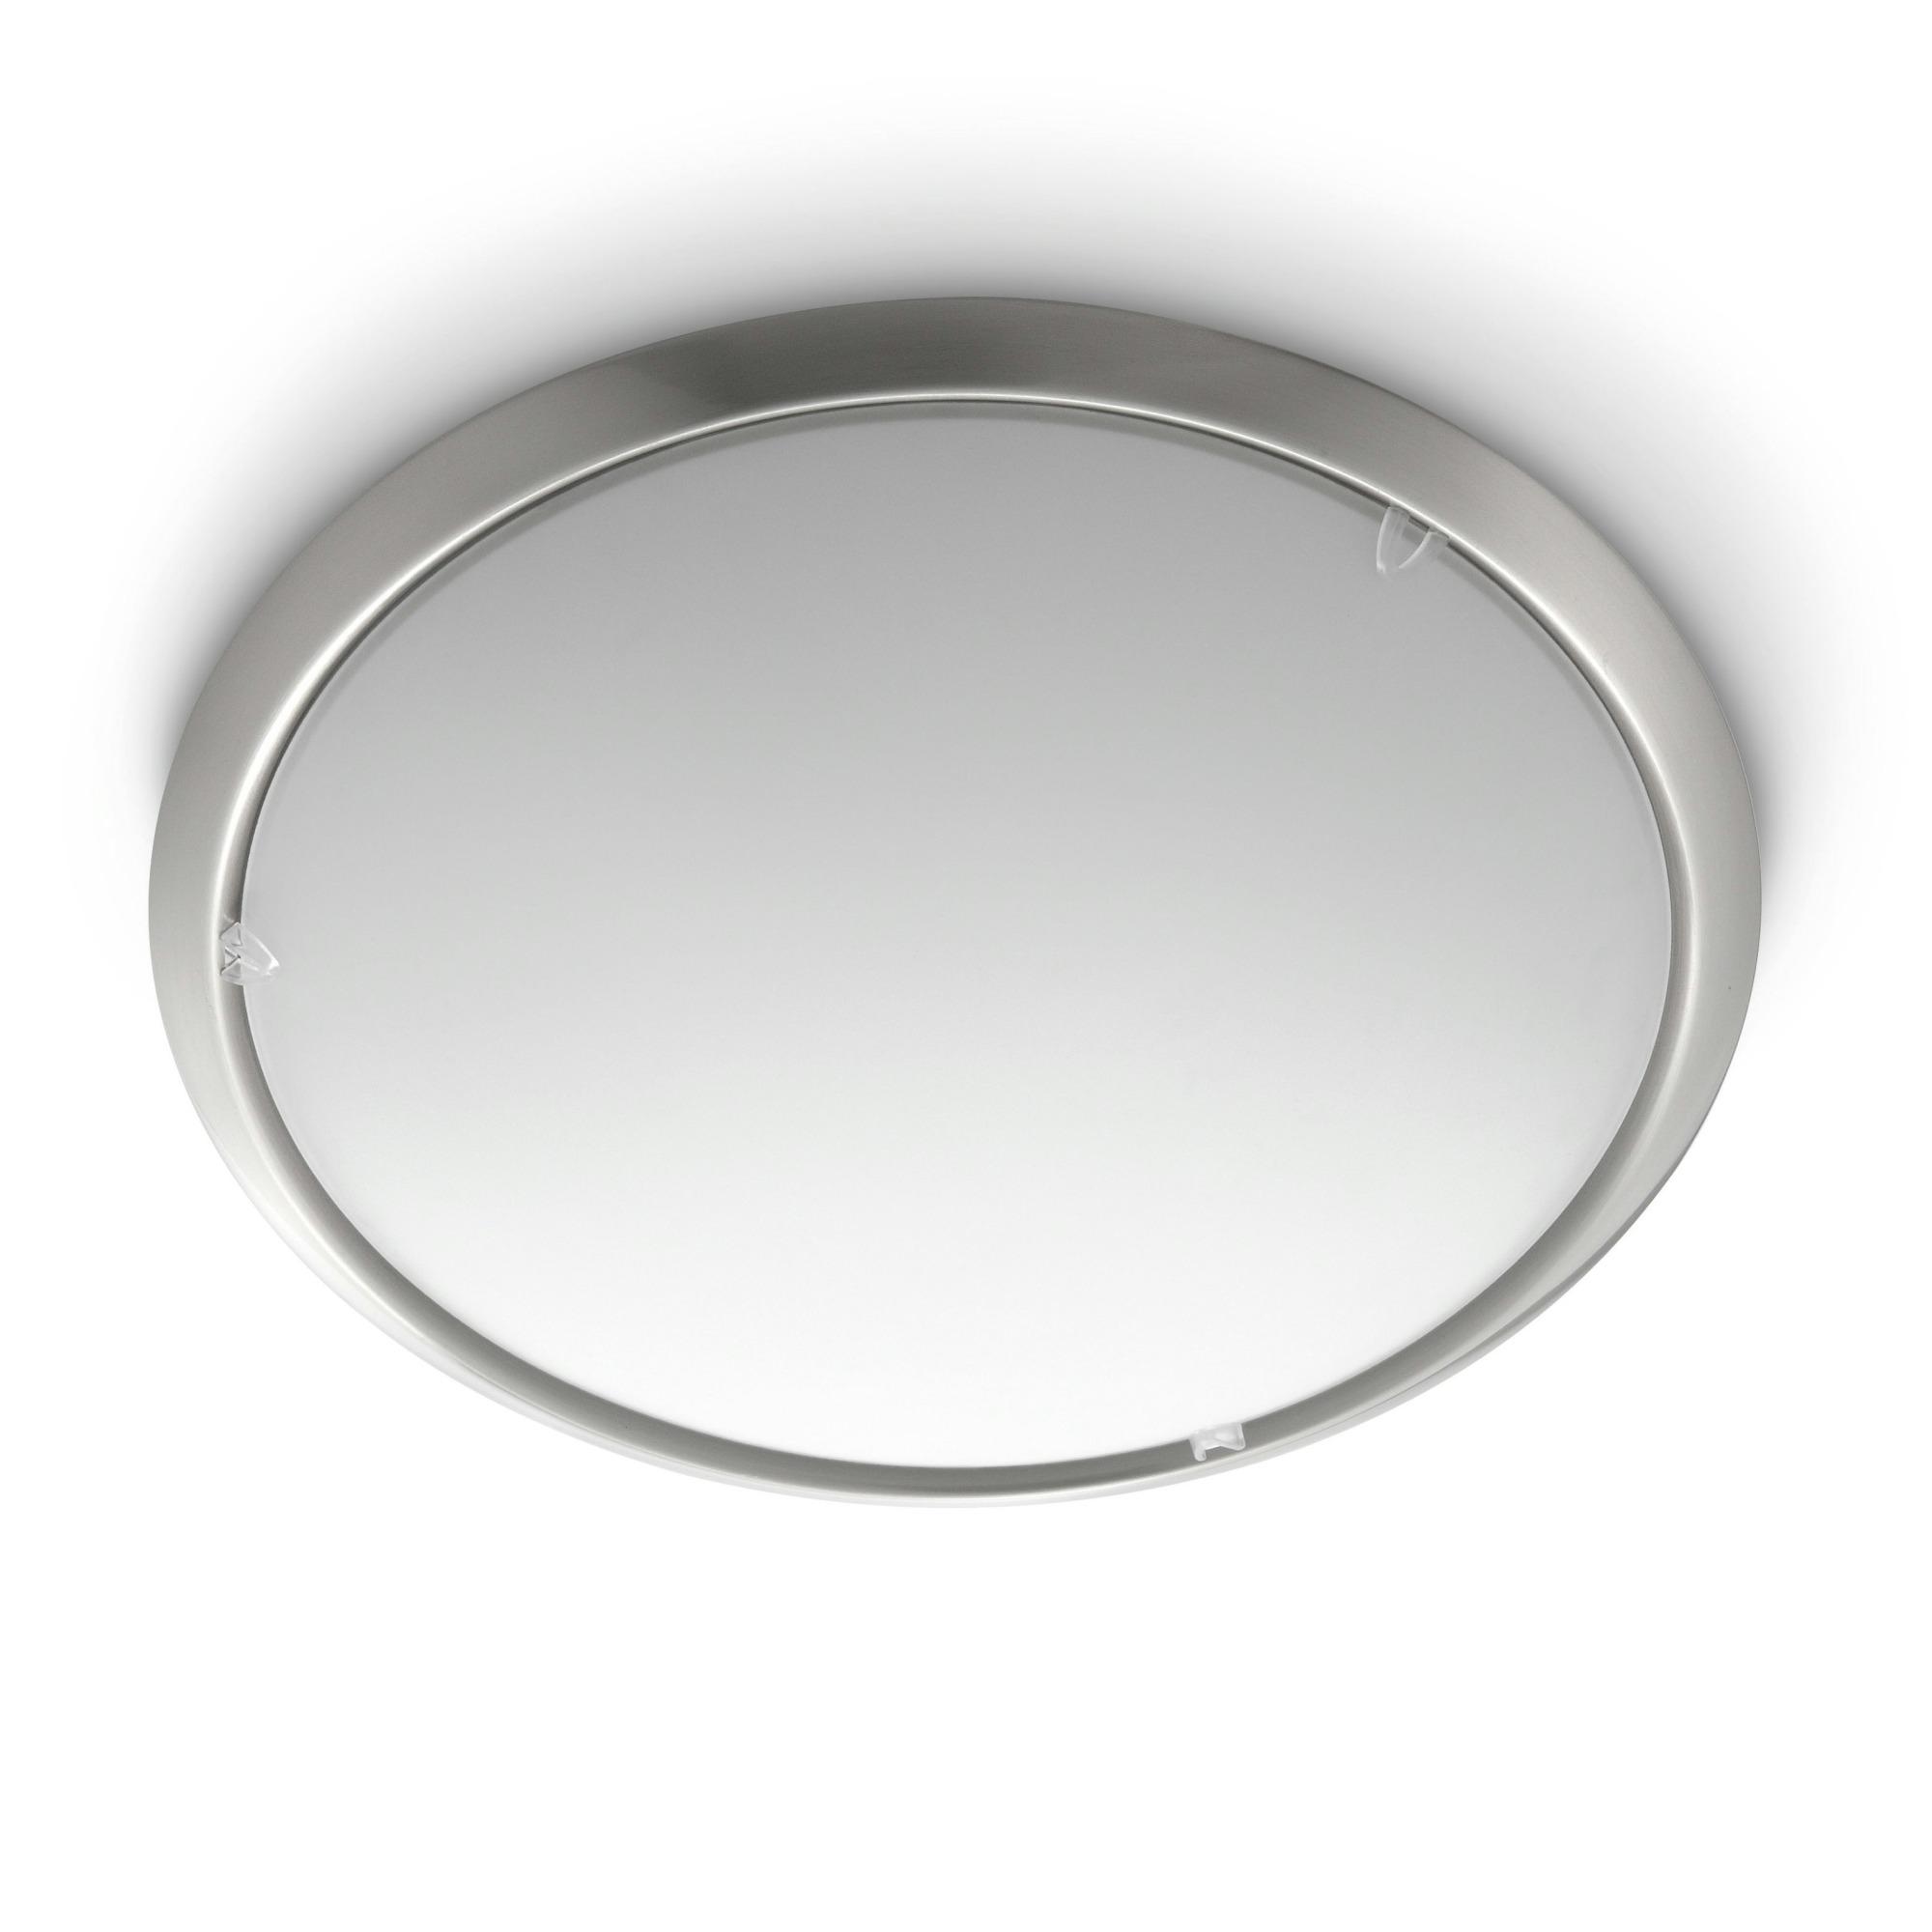 Philips myliving circle plafondlamp 230 v 2 x 75 w e27 grijs